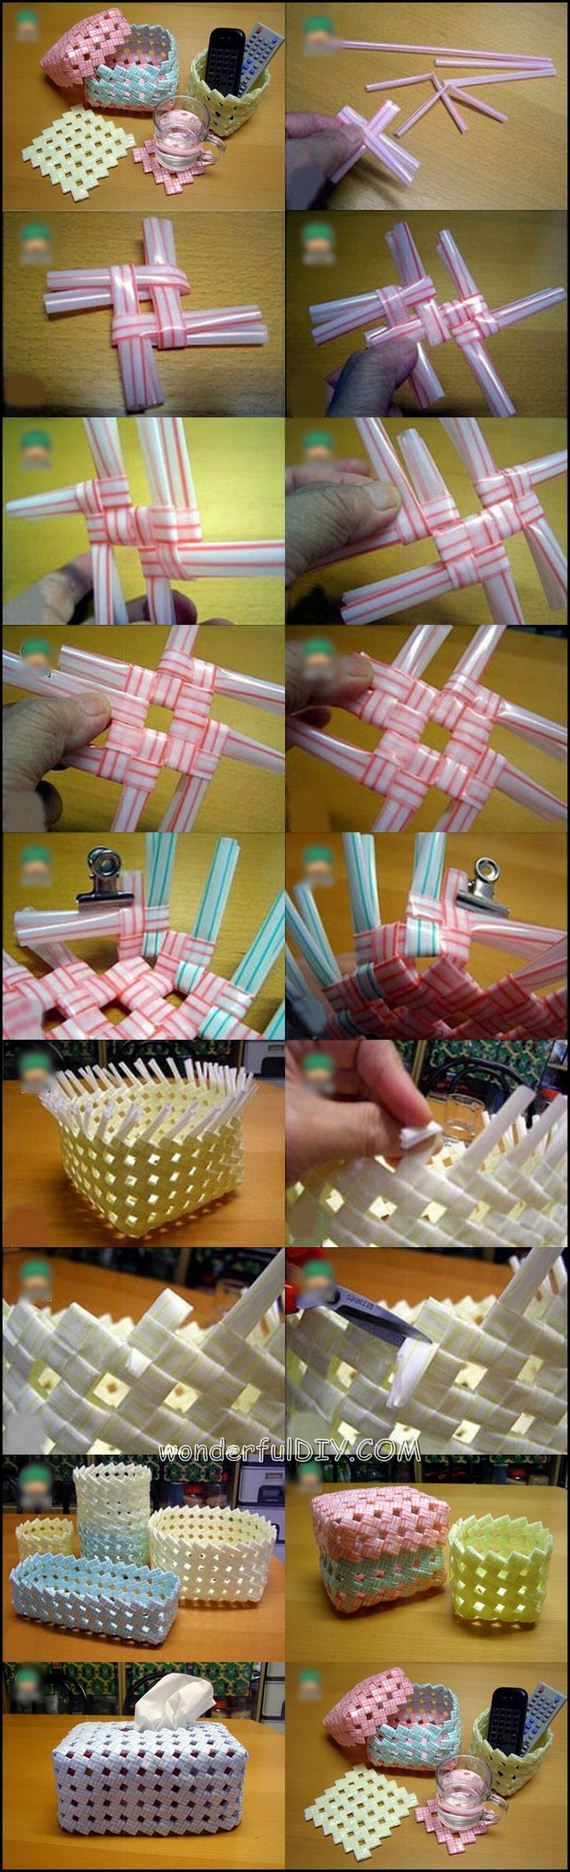 27-drinking-straw-crafts